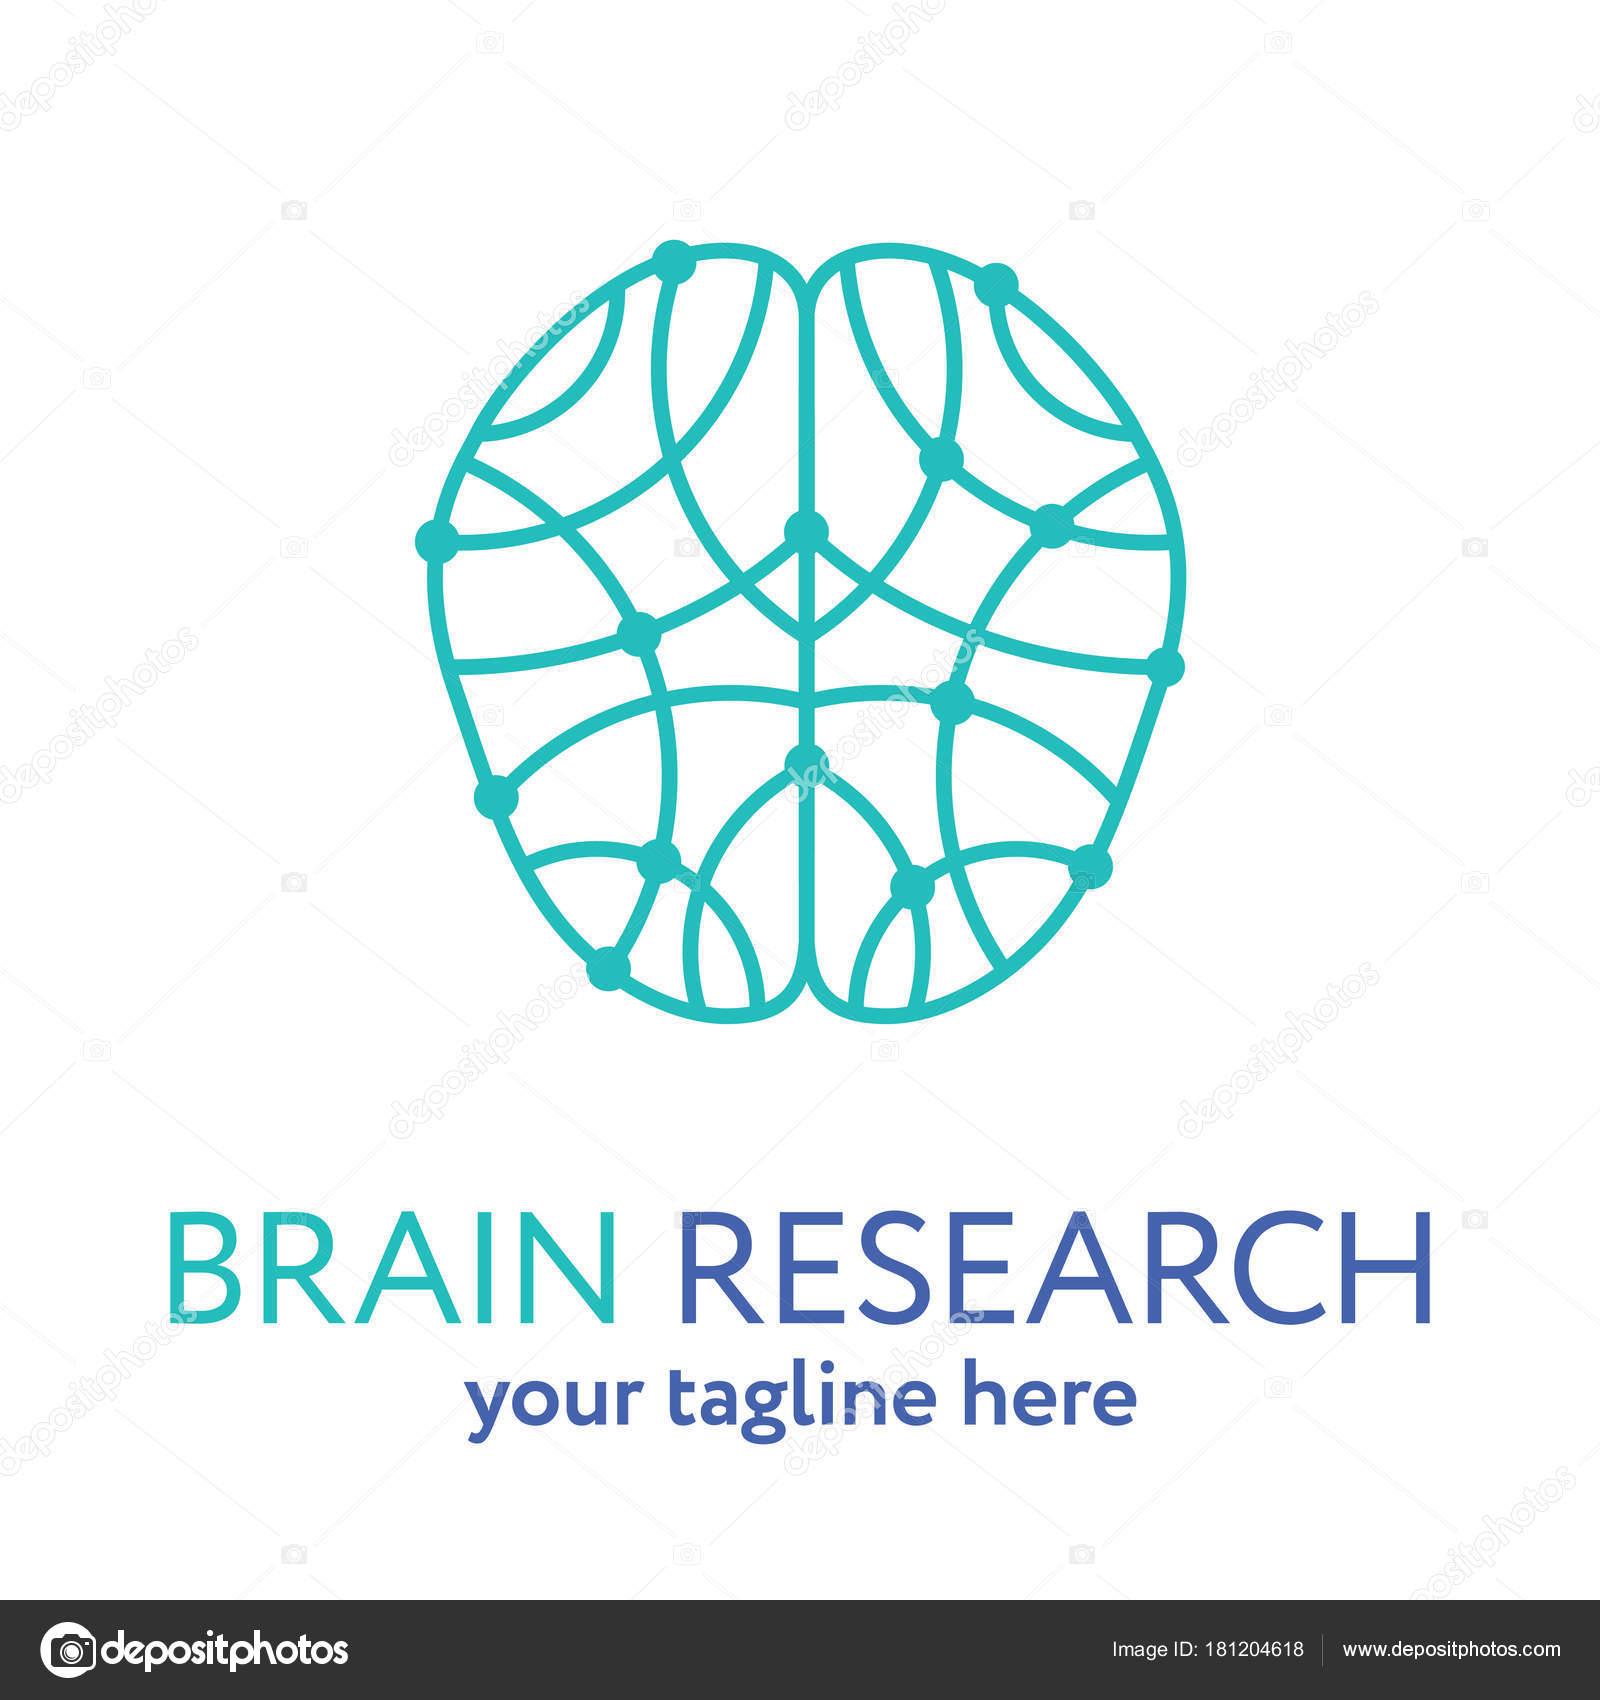 Cerebro Humano Línea Icono Logo Plantilla Concepto Investigación ...